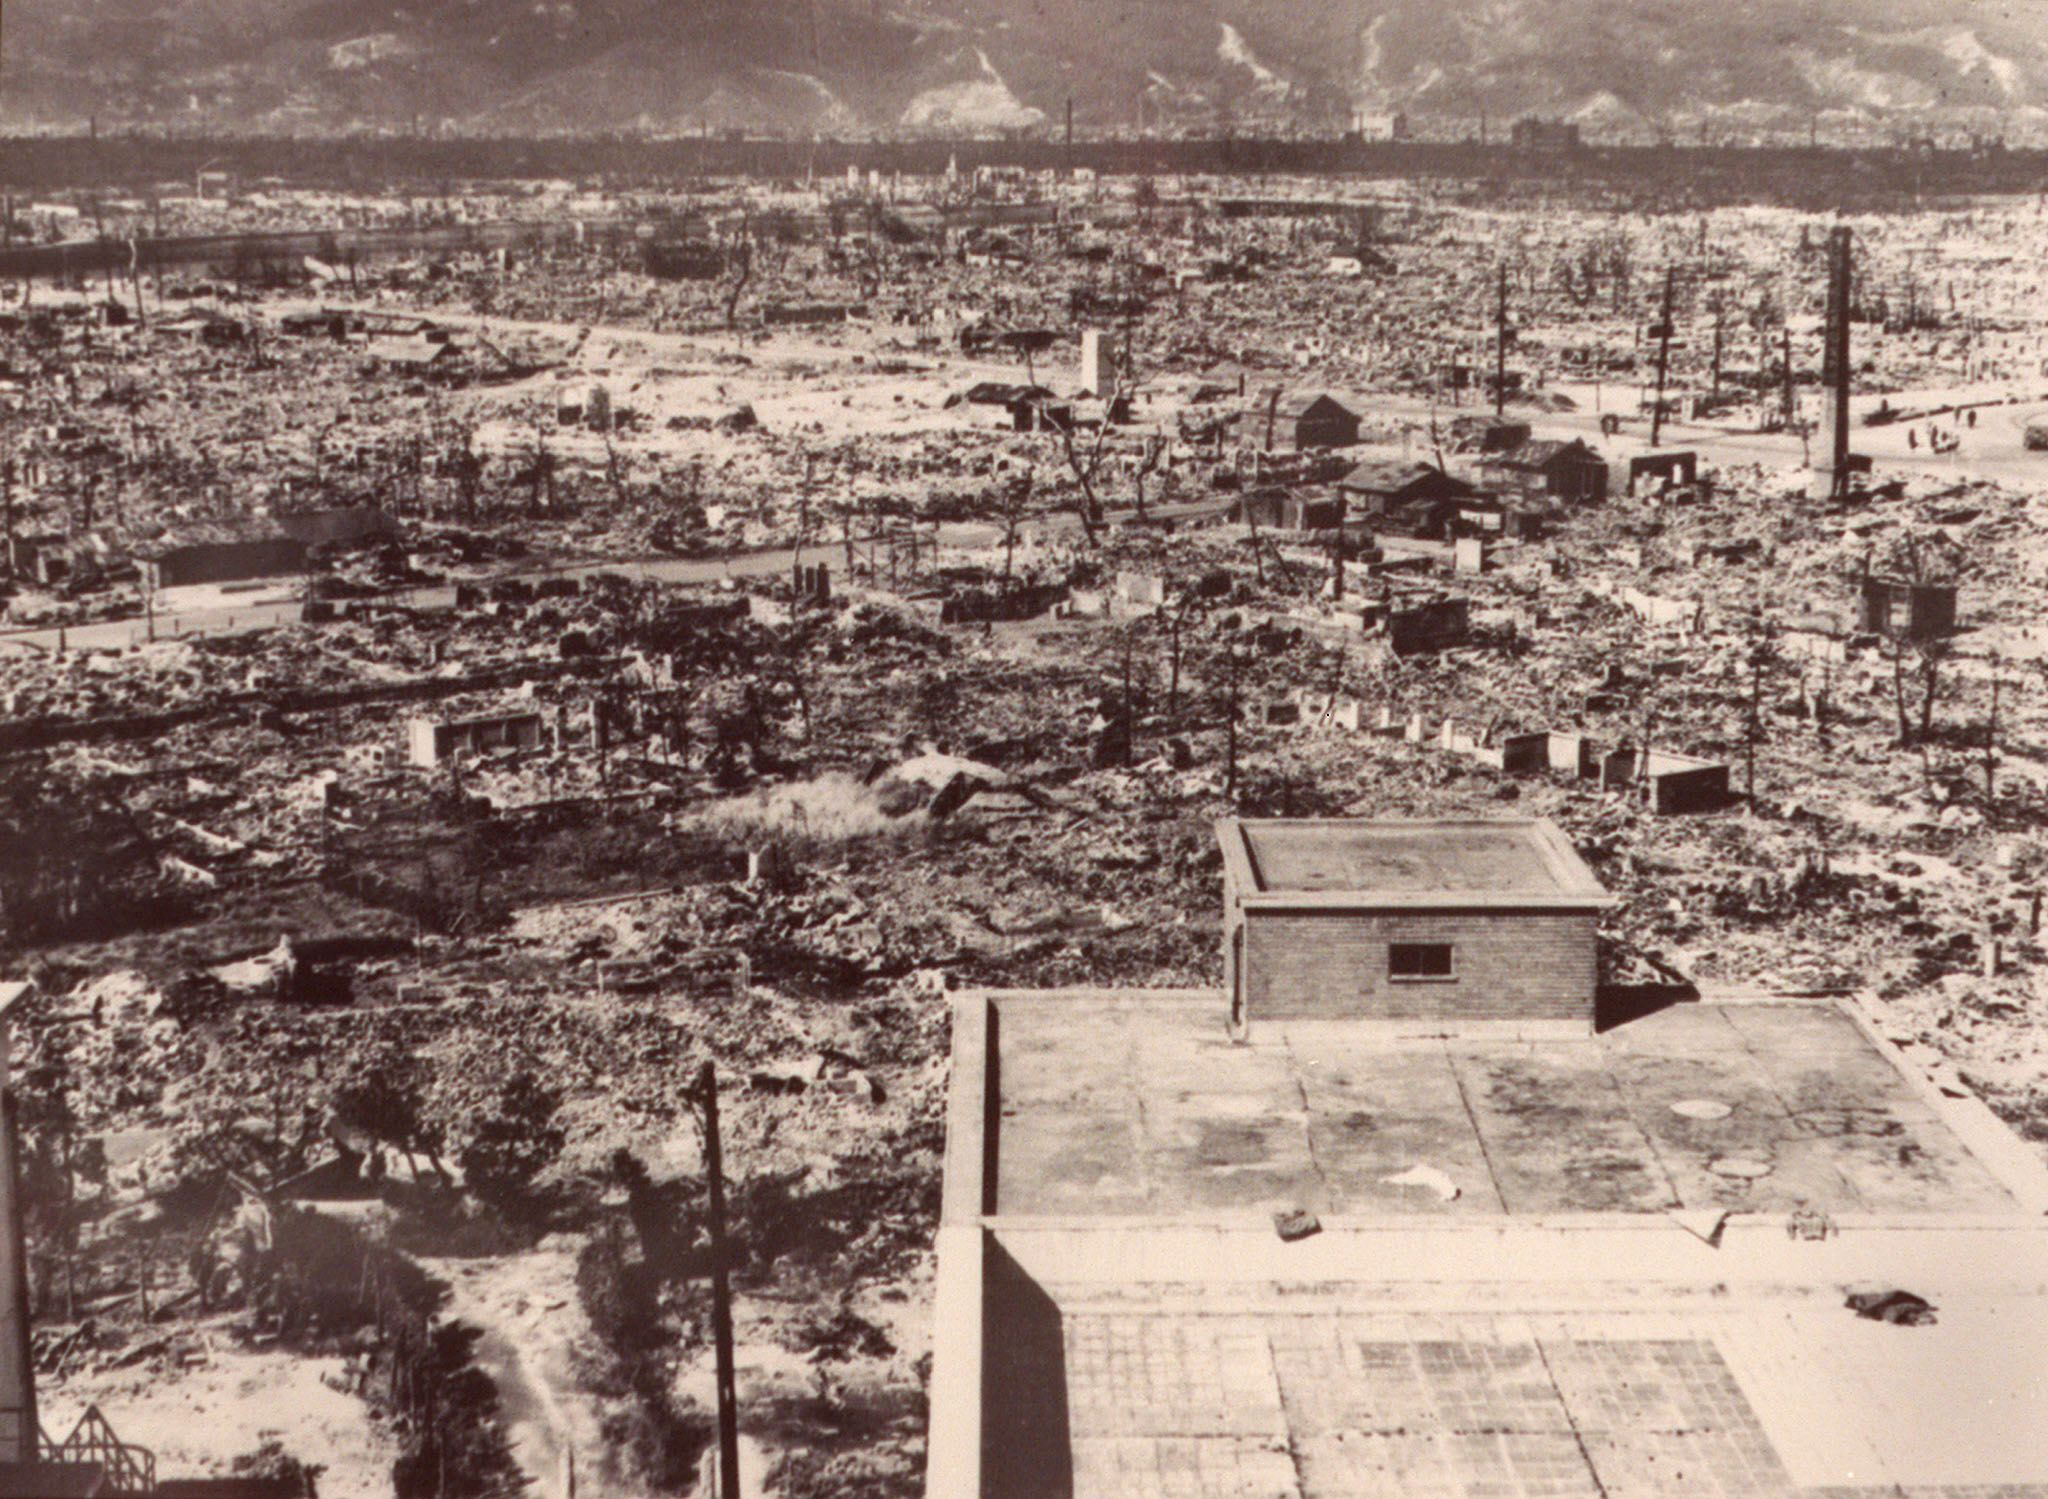 Hiroshima, Nagasaki survivors fear Trump policies could lead to new nuclear attacks